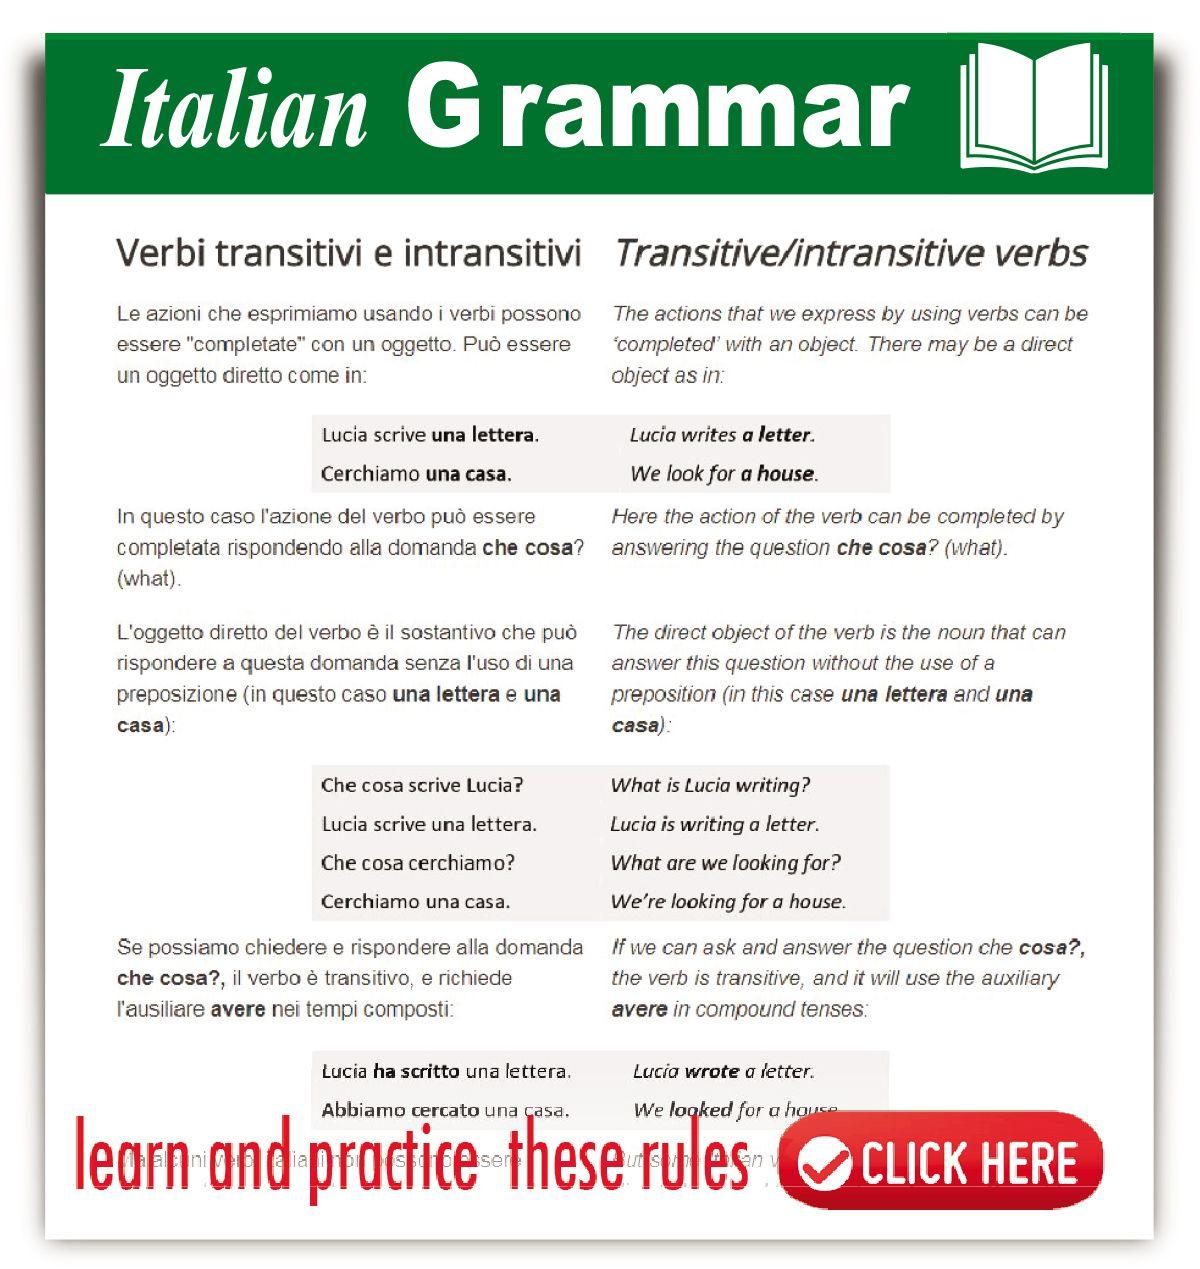 Italian Transitive Intransitive Verbs